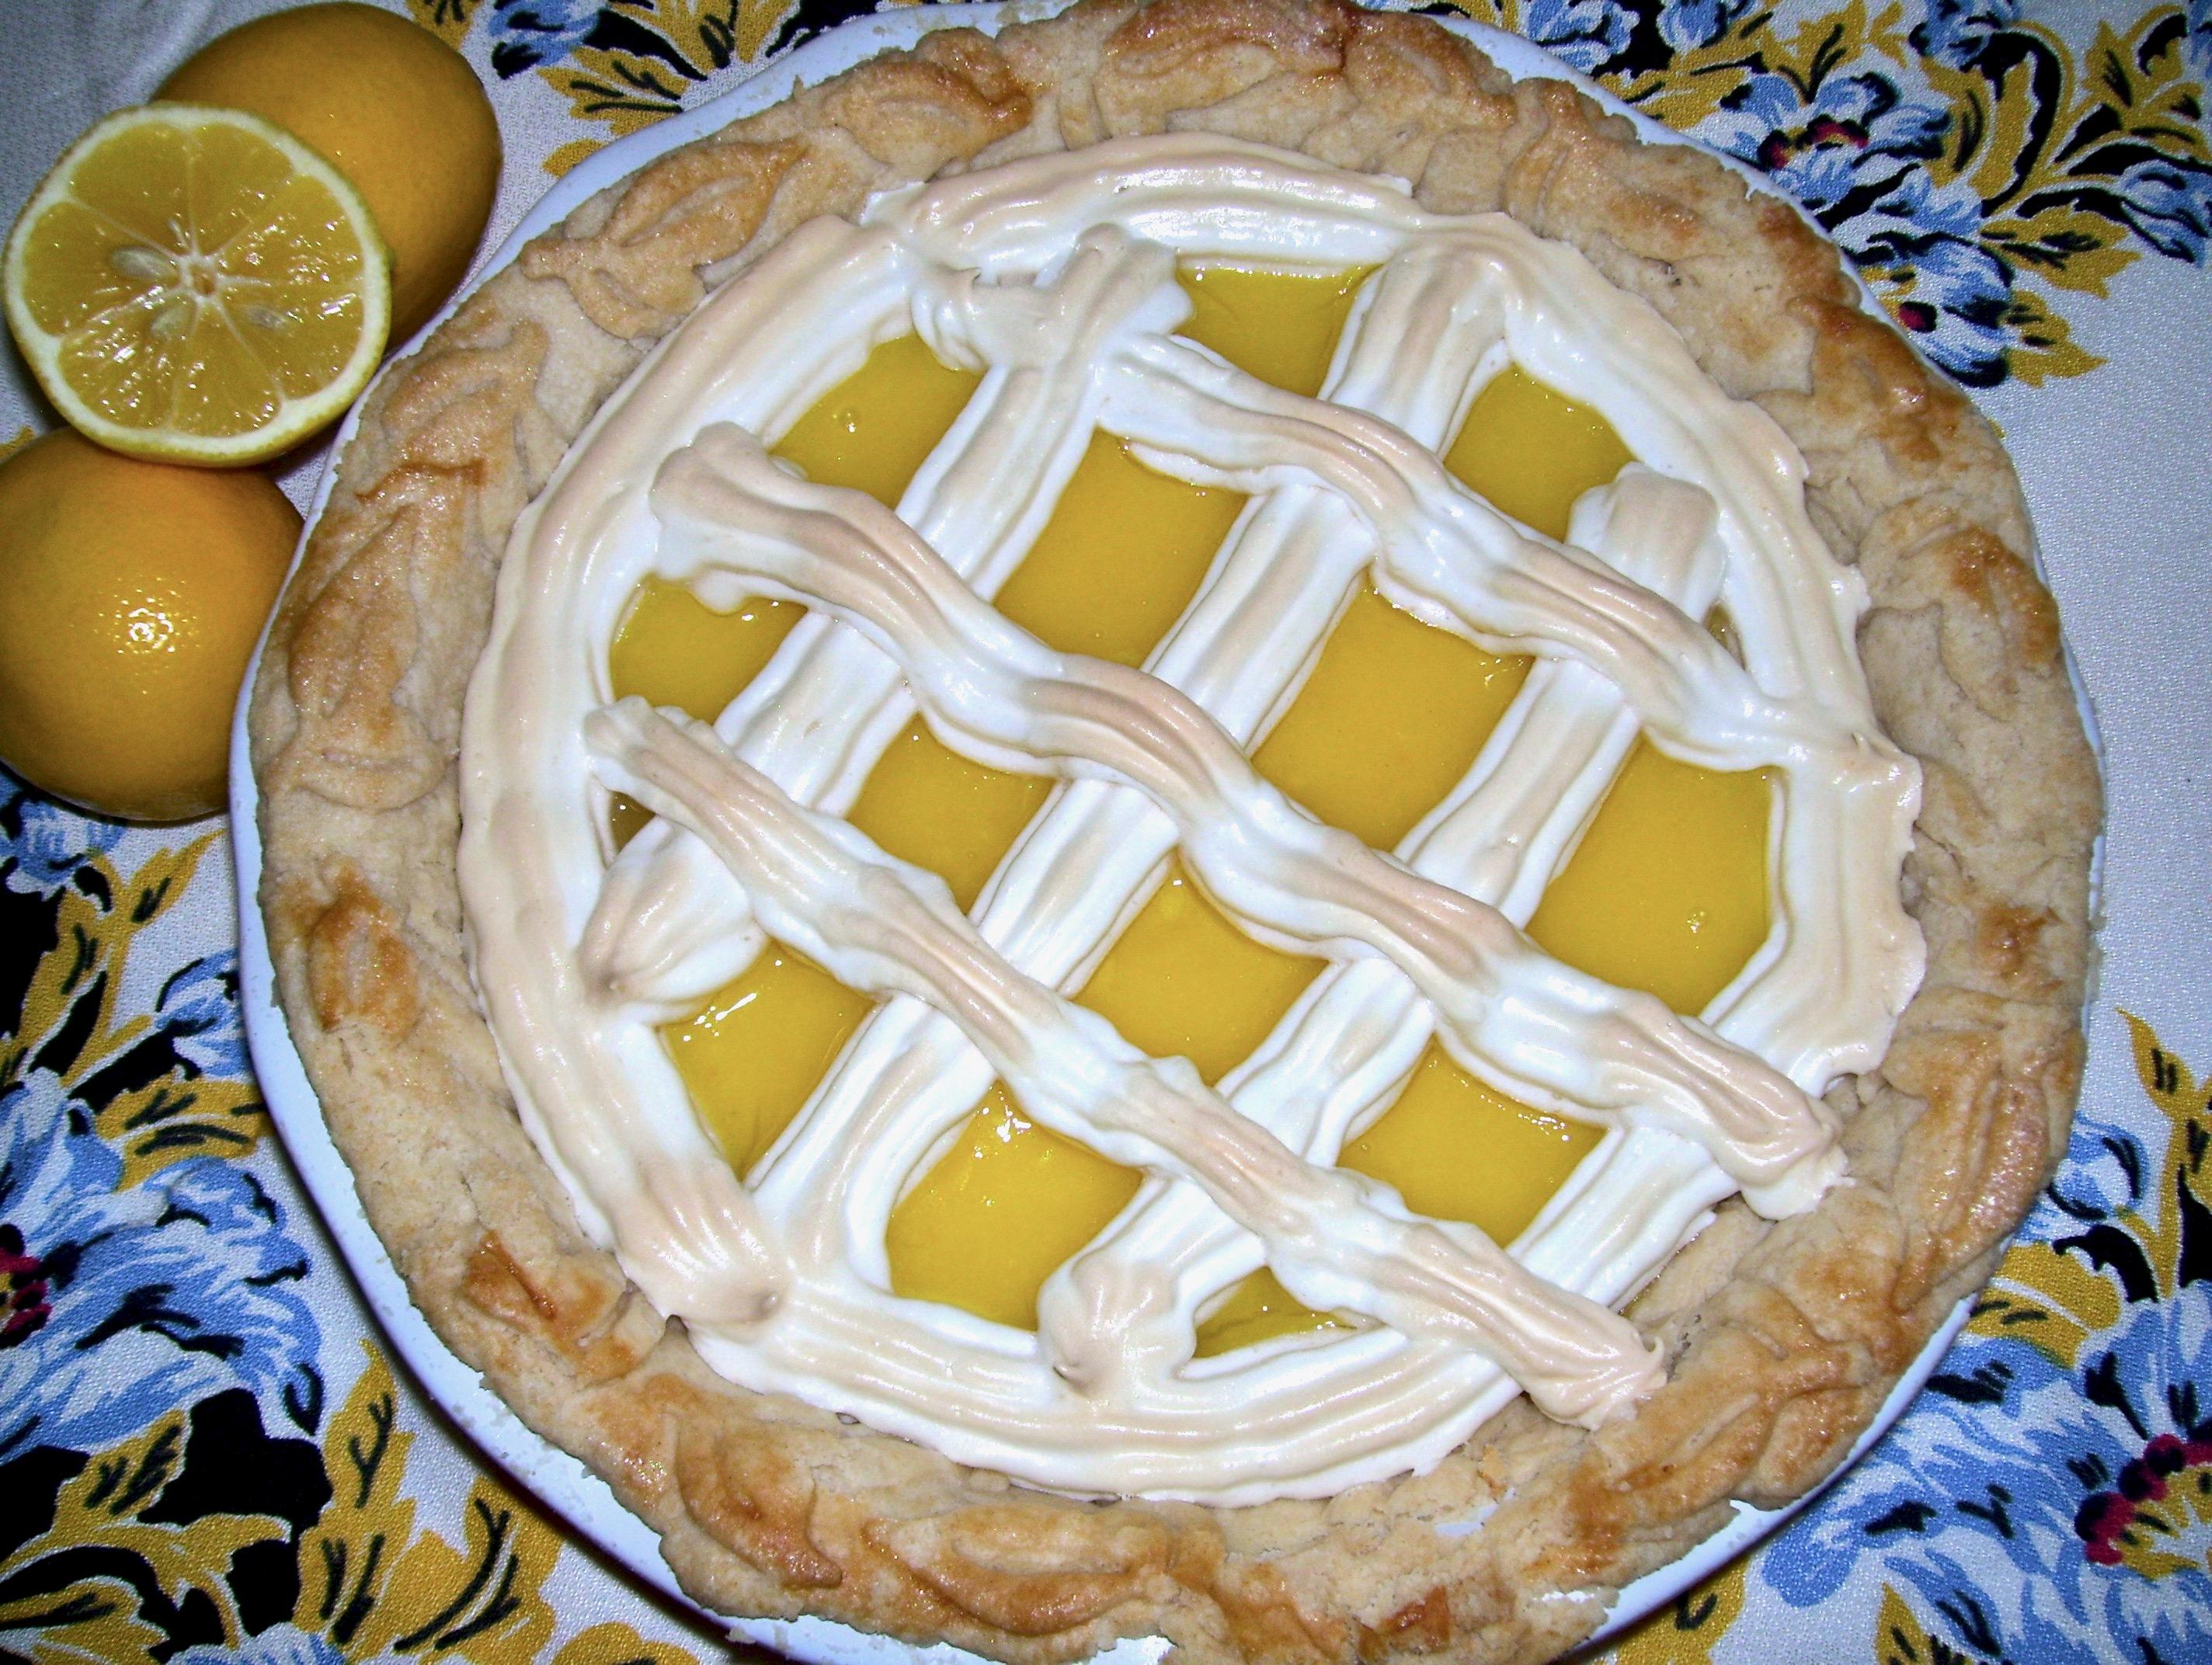 lattice topped lemon meringue pie